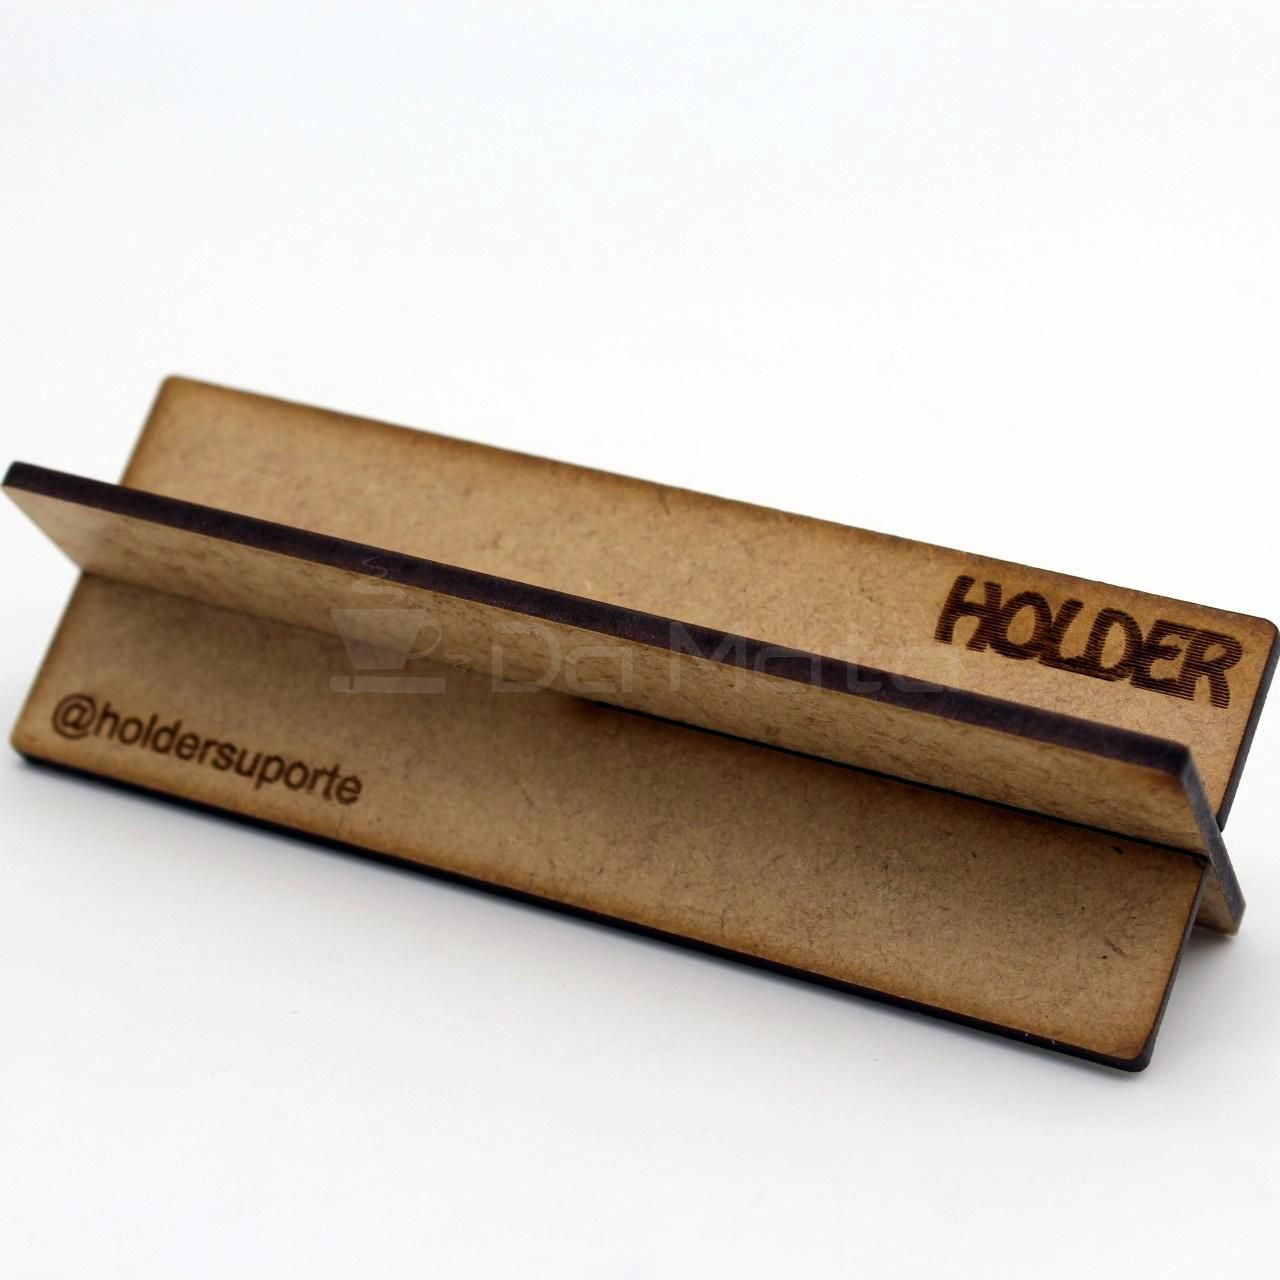 Suporte p/ Seda Holder